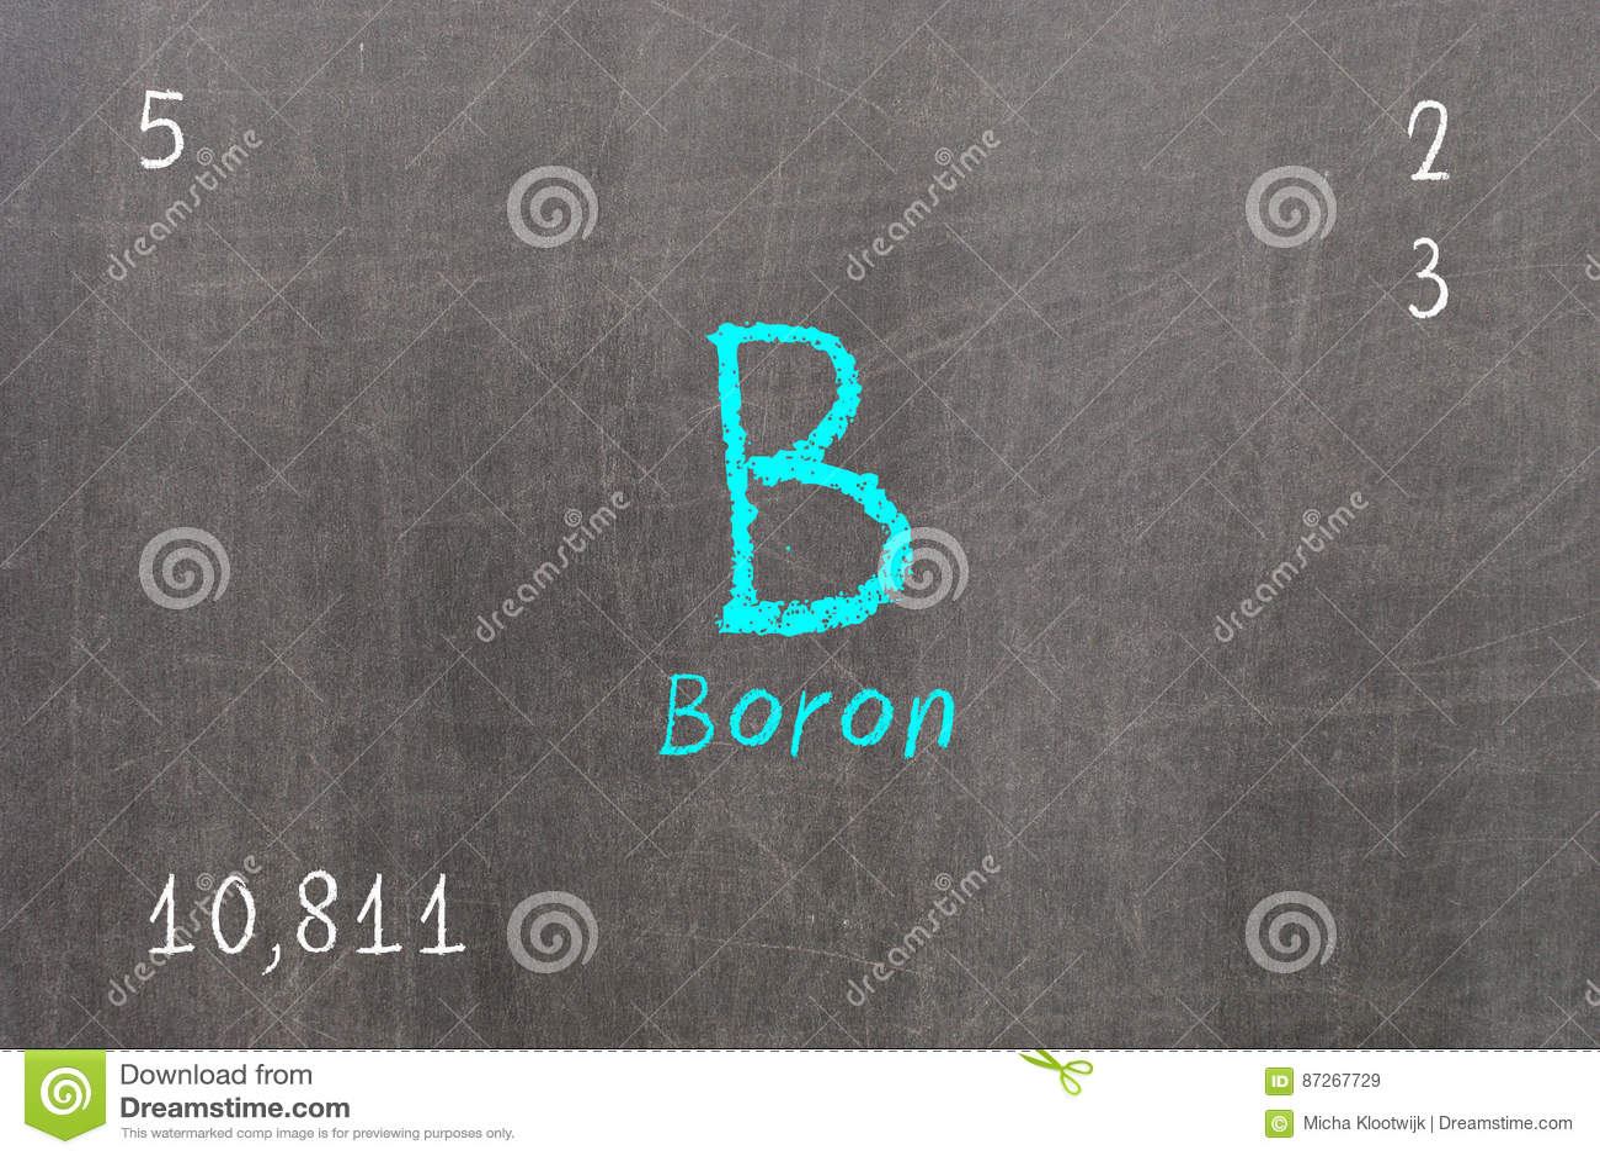 Pizarra con la tabla peridica boro stock de ilustracin download comp urtaz Images